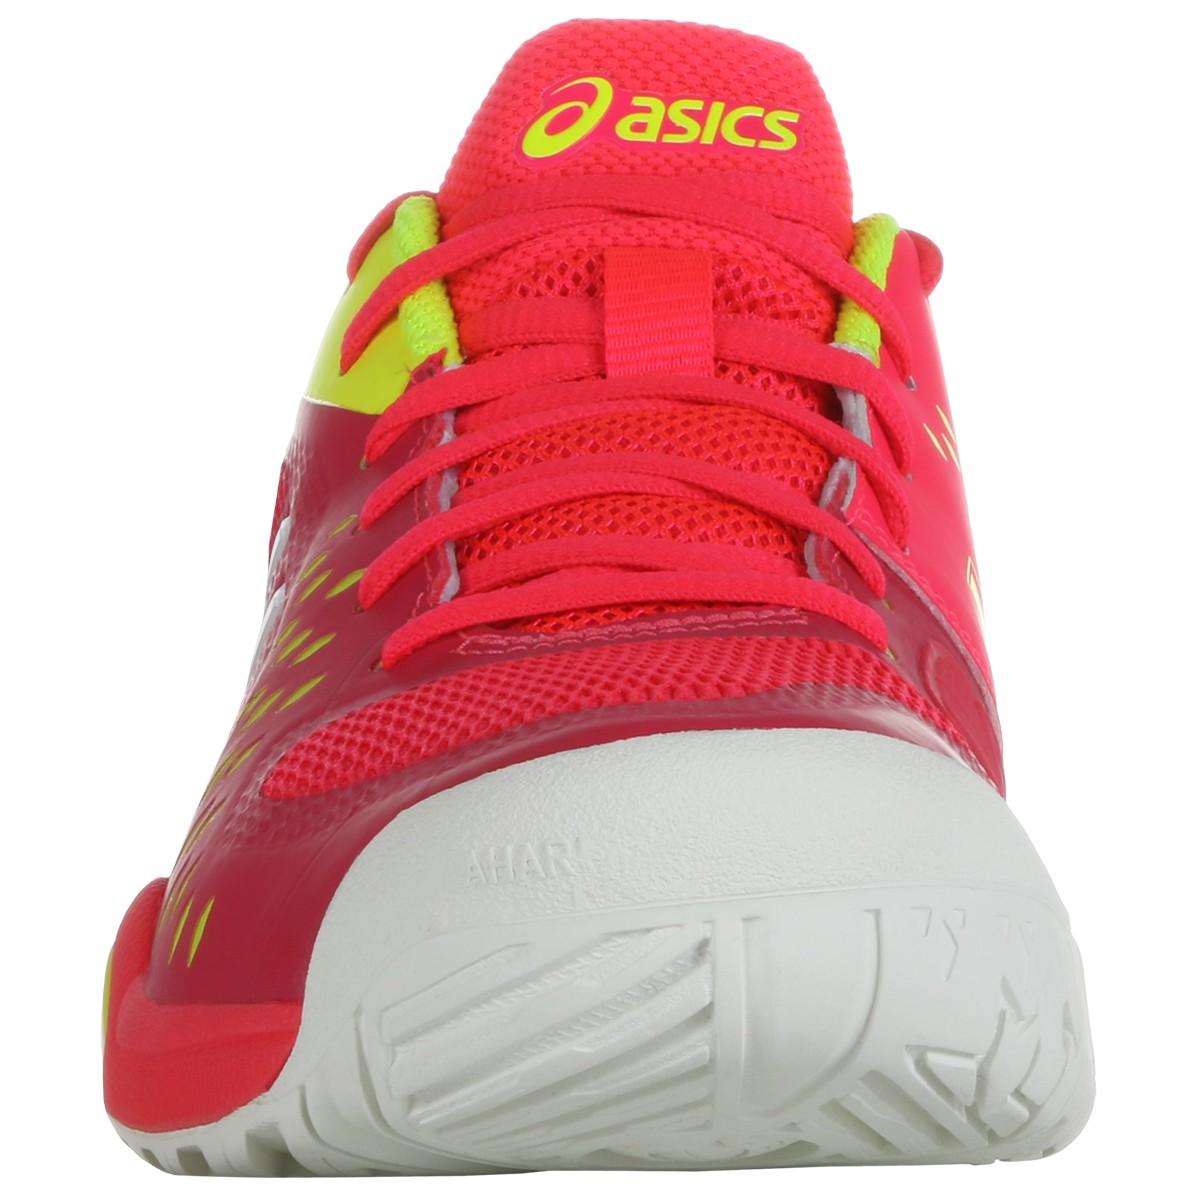 Toutes Femme Chaussures Asics Challenger 12 Surfaces Gel